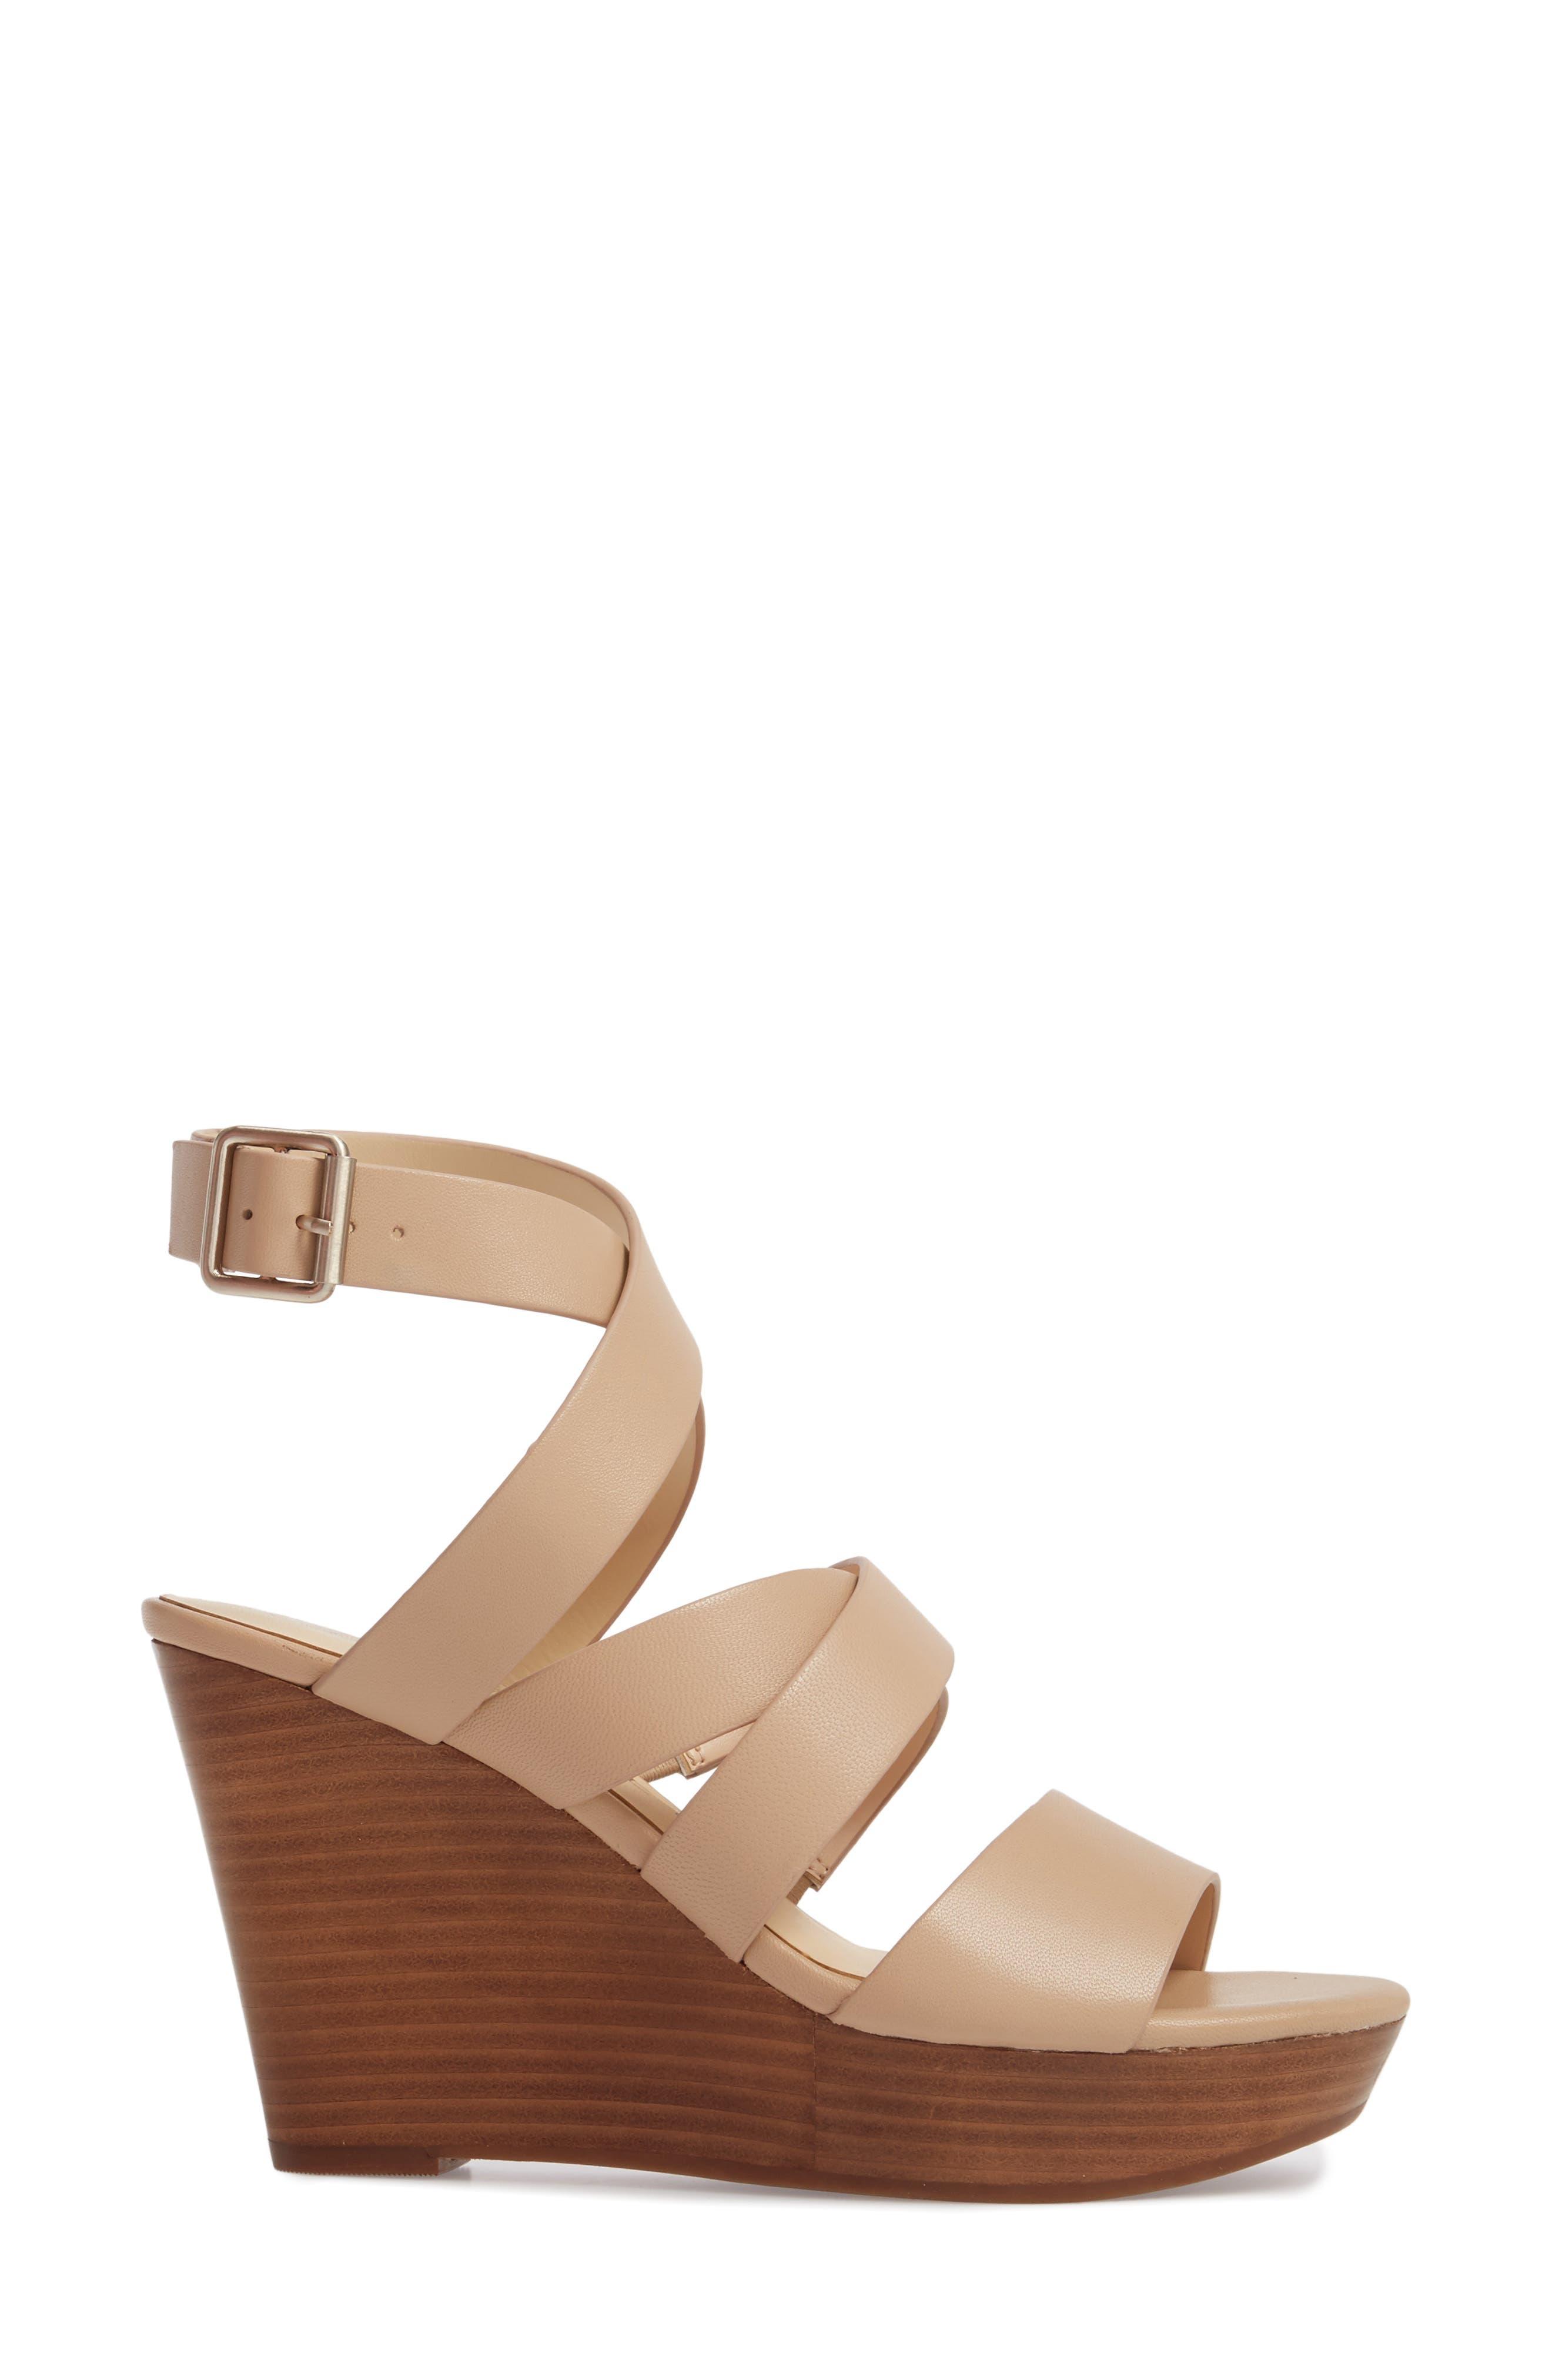 Pippy Platform Sandal,                             Alternate thumbnail 3, color,                             Tan